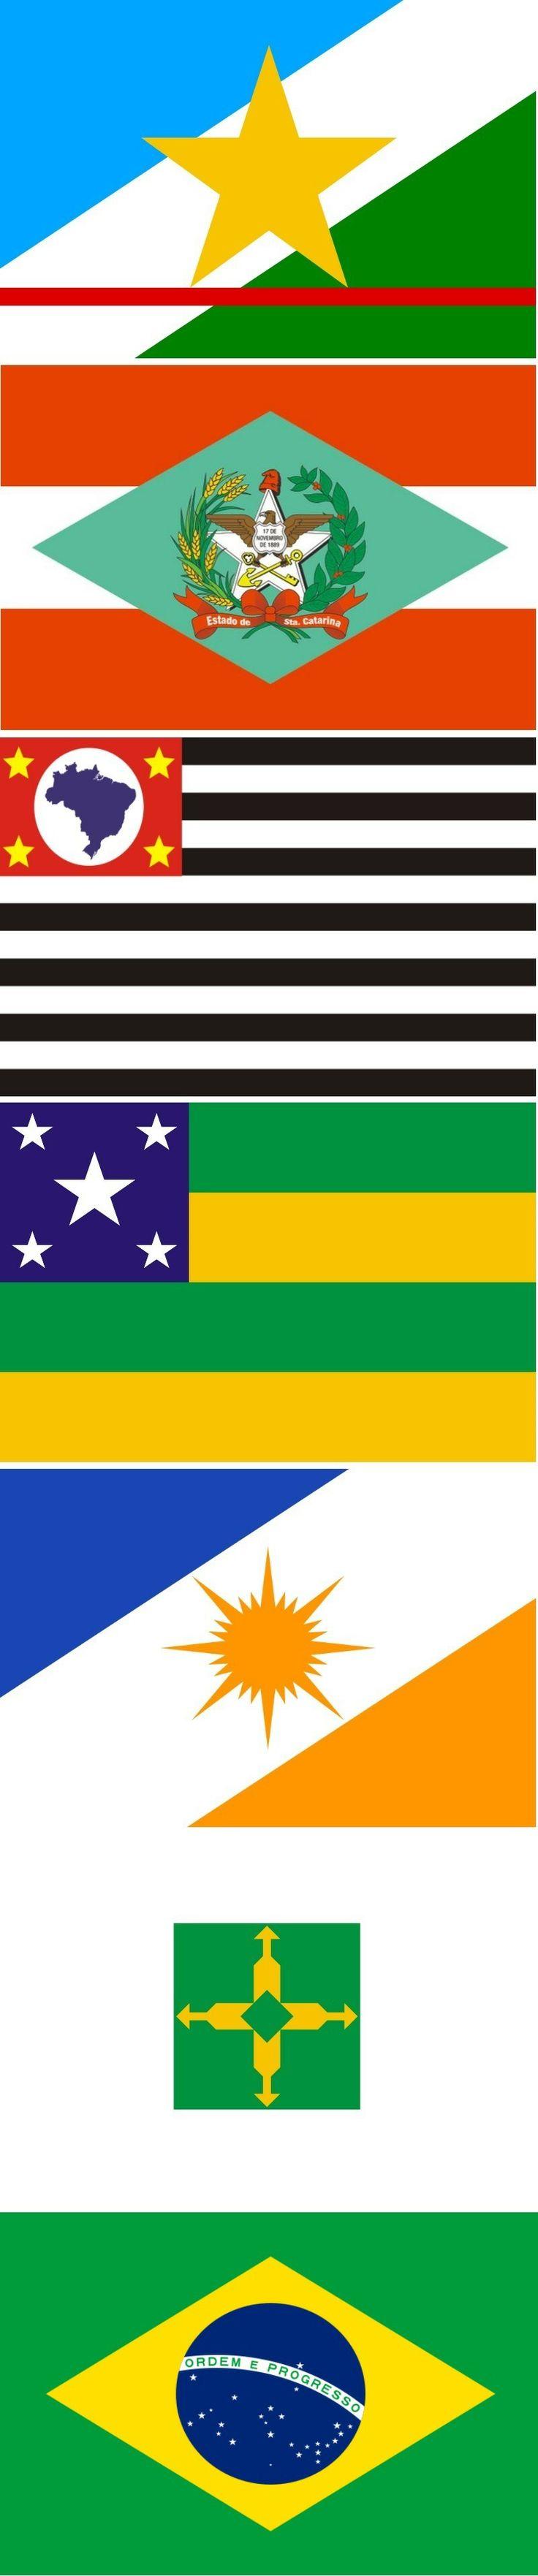 Flags of the states of Brazil: RORAIMA-SANTA CATARINA-SÃO PAULO-SERGIPE-TOCANTINS-DISTRITO FEDERAL - BRASIL